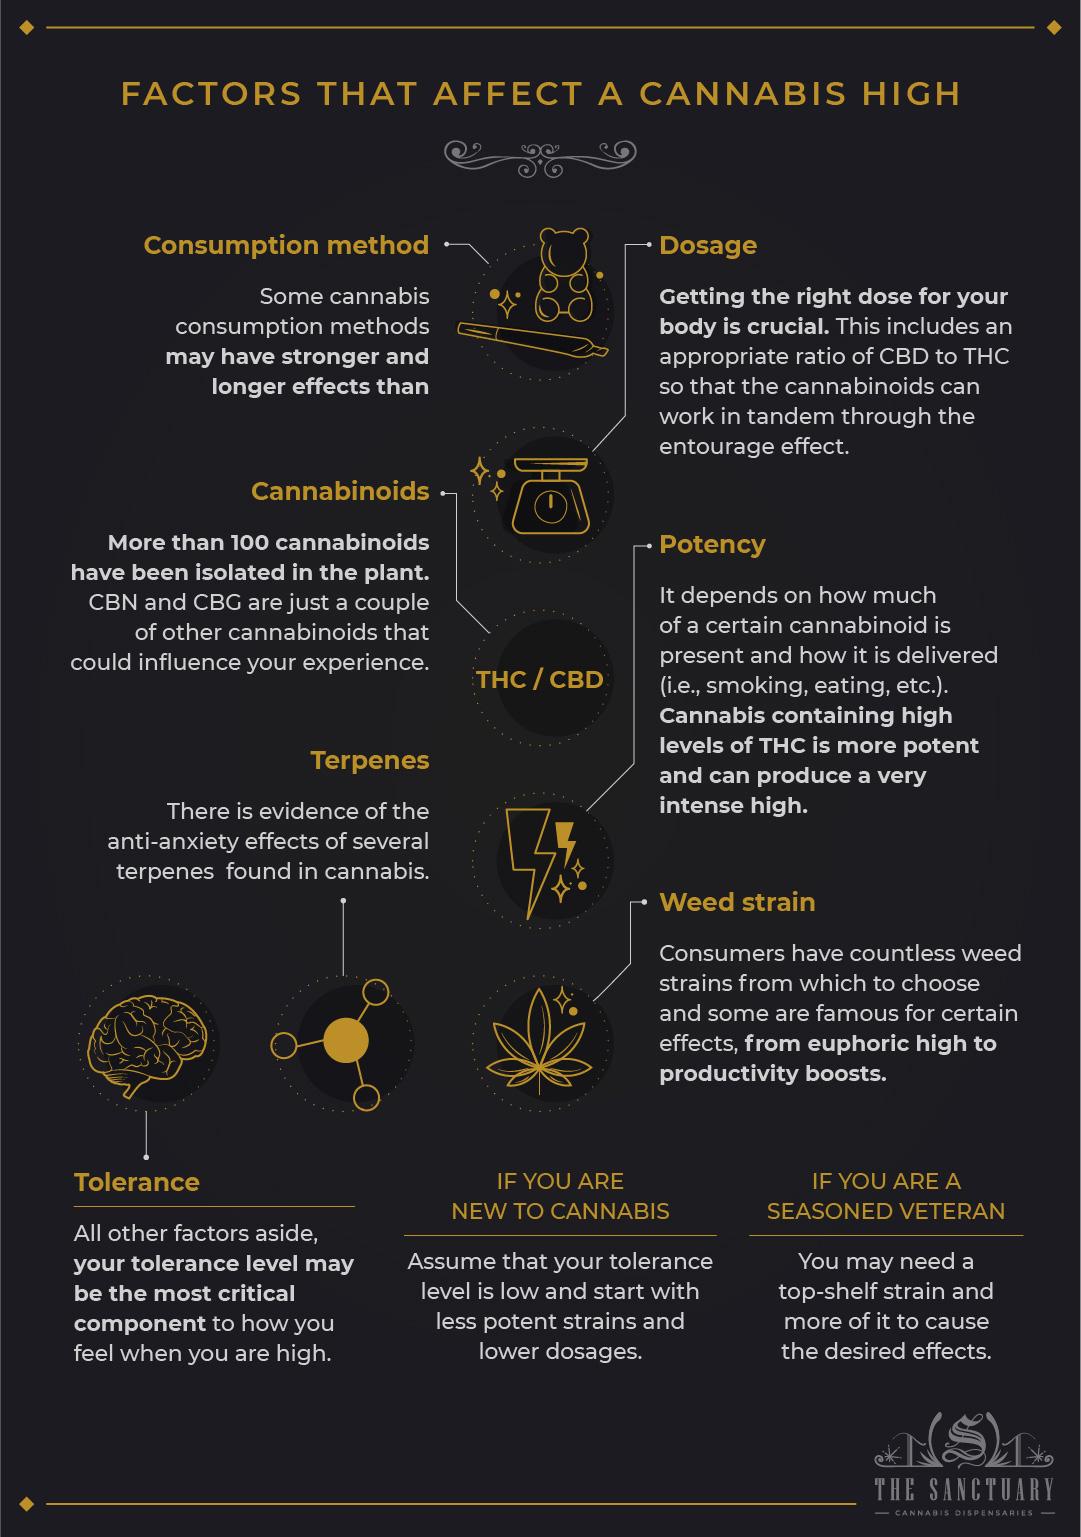 Factors that affect a cannabis high